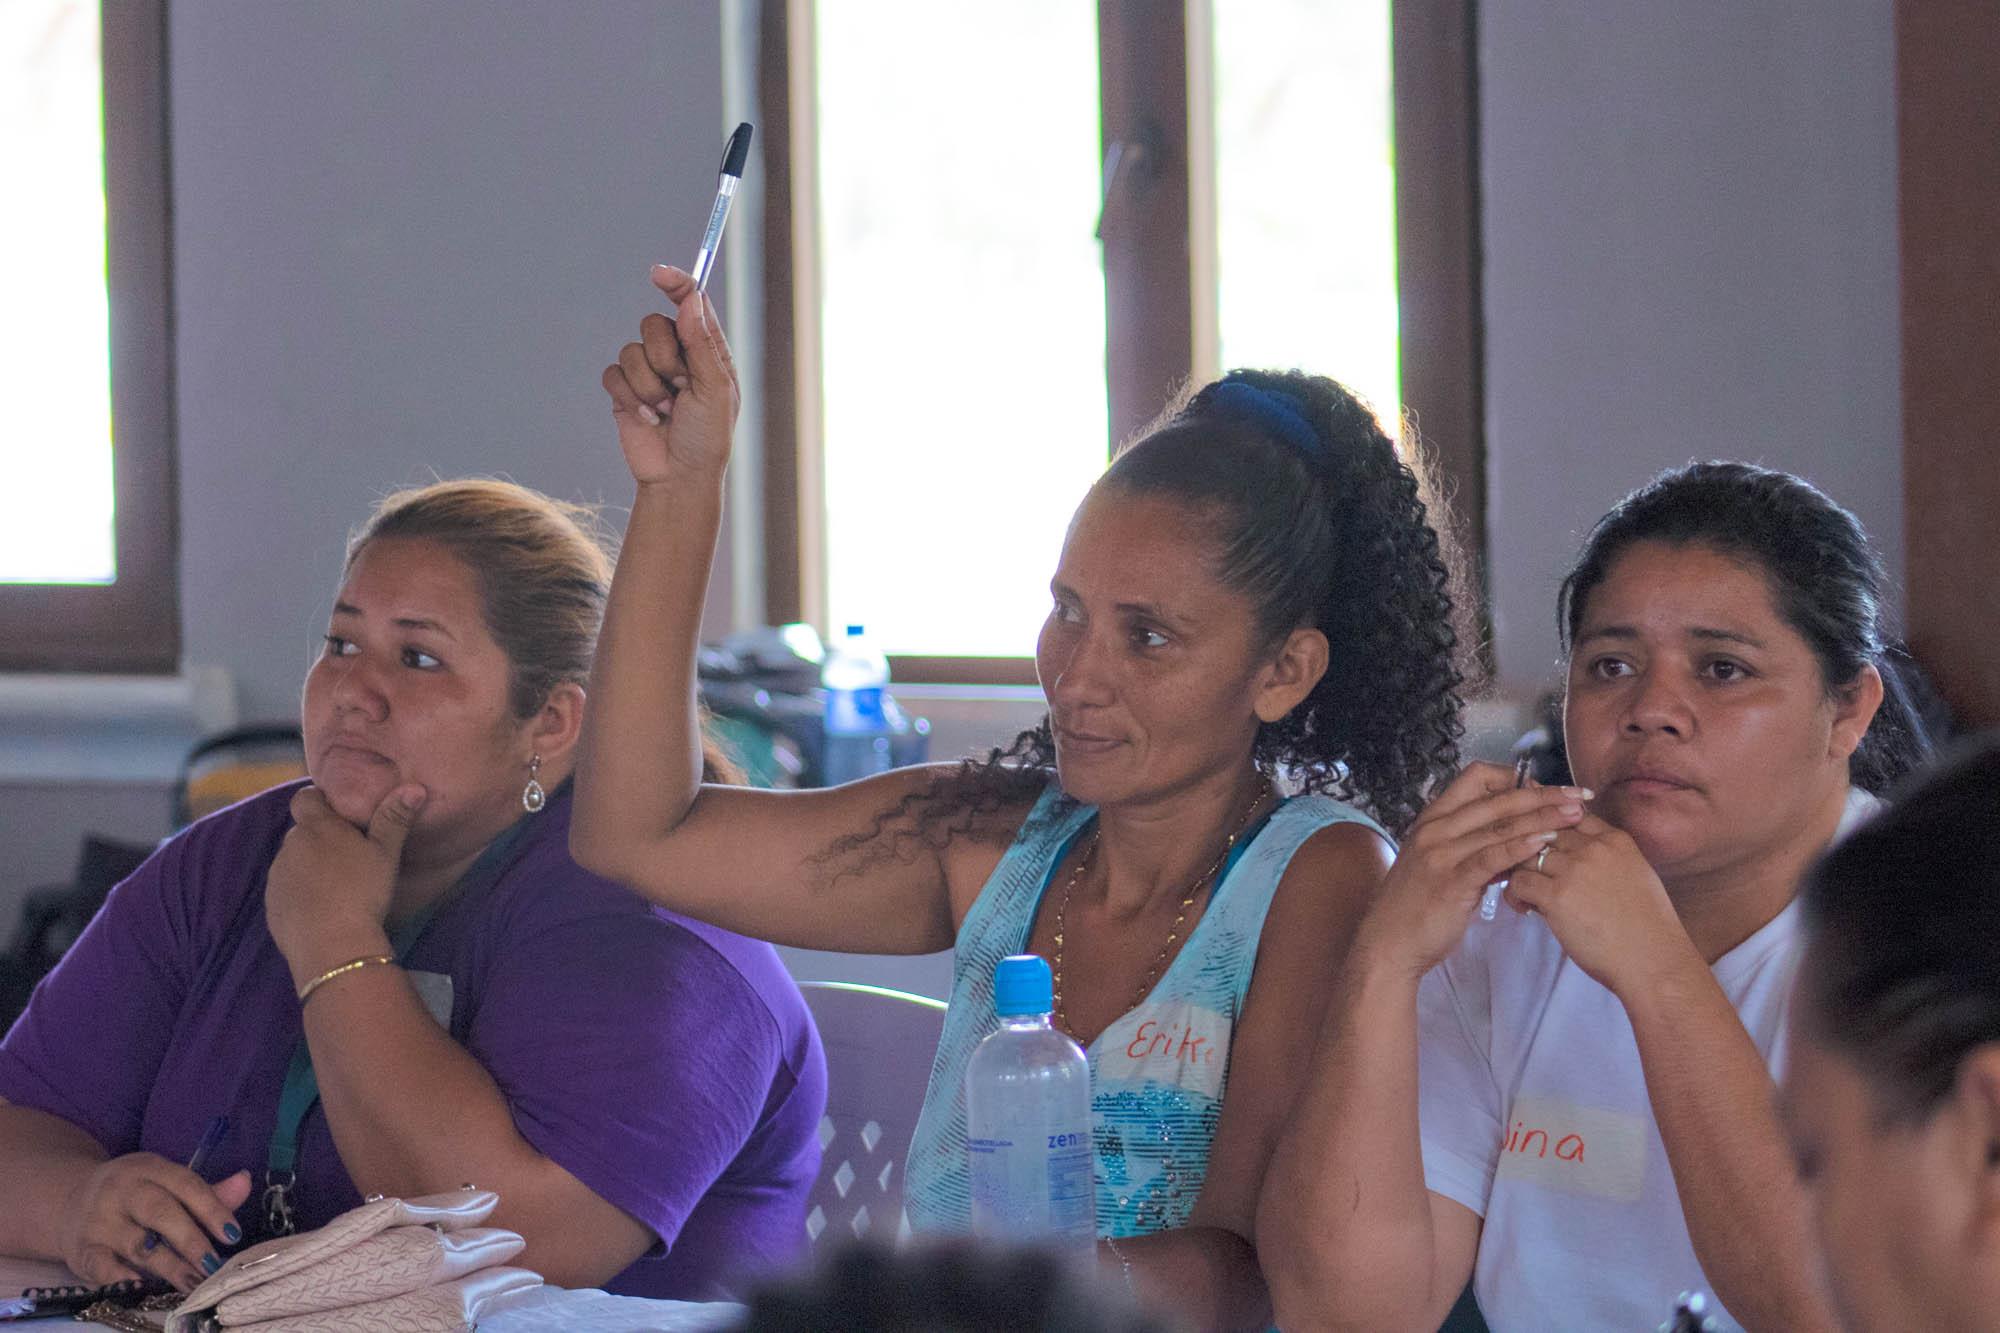 MujeresempoderadasTela3 (1 of 1)